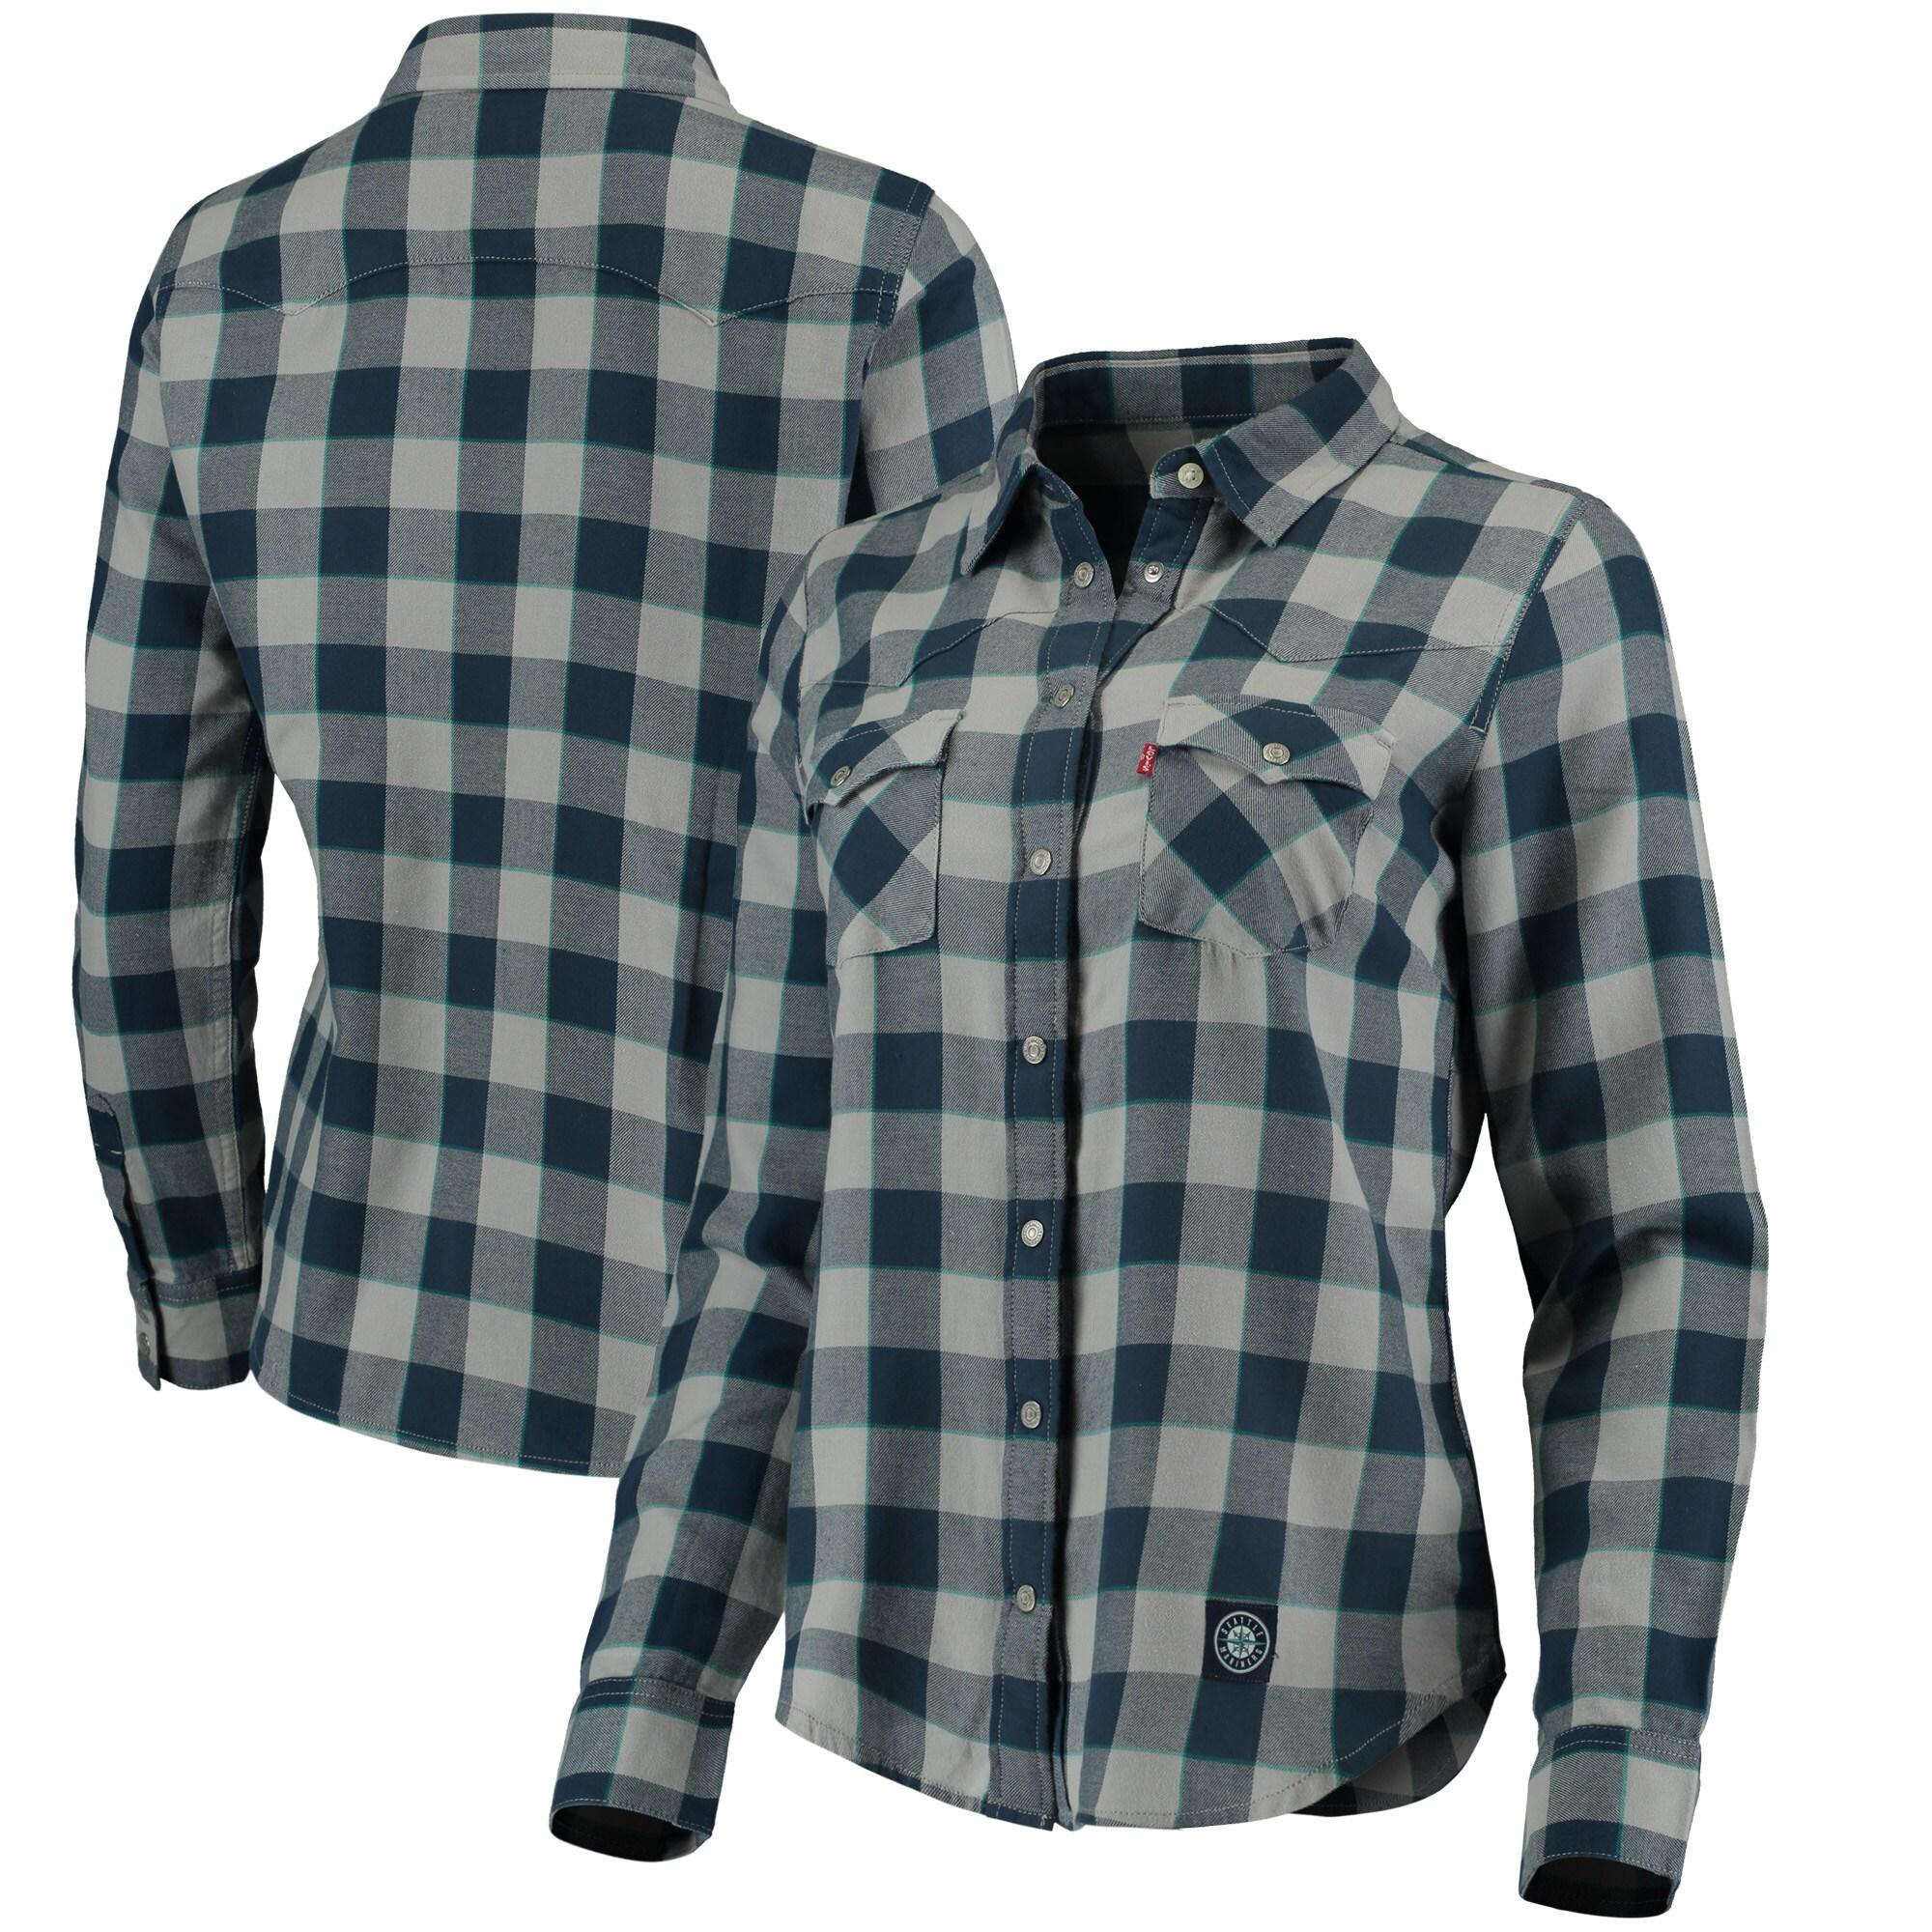 Seattle Mariners Levi's Women's Western Full-Snap Shirt - Navy